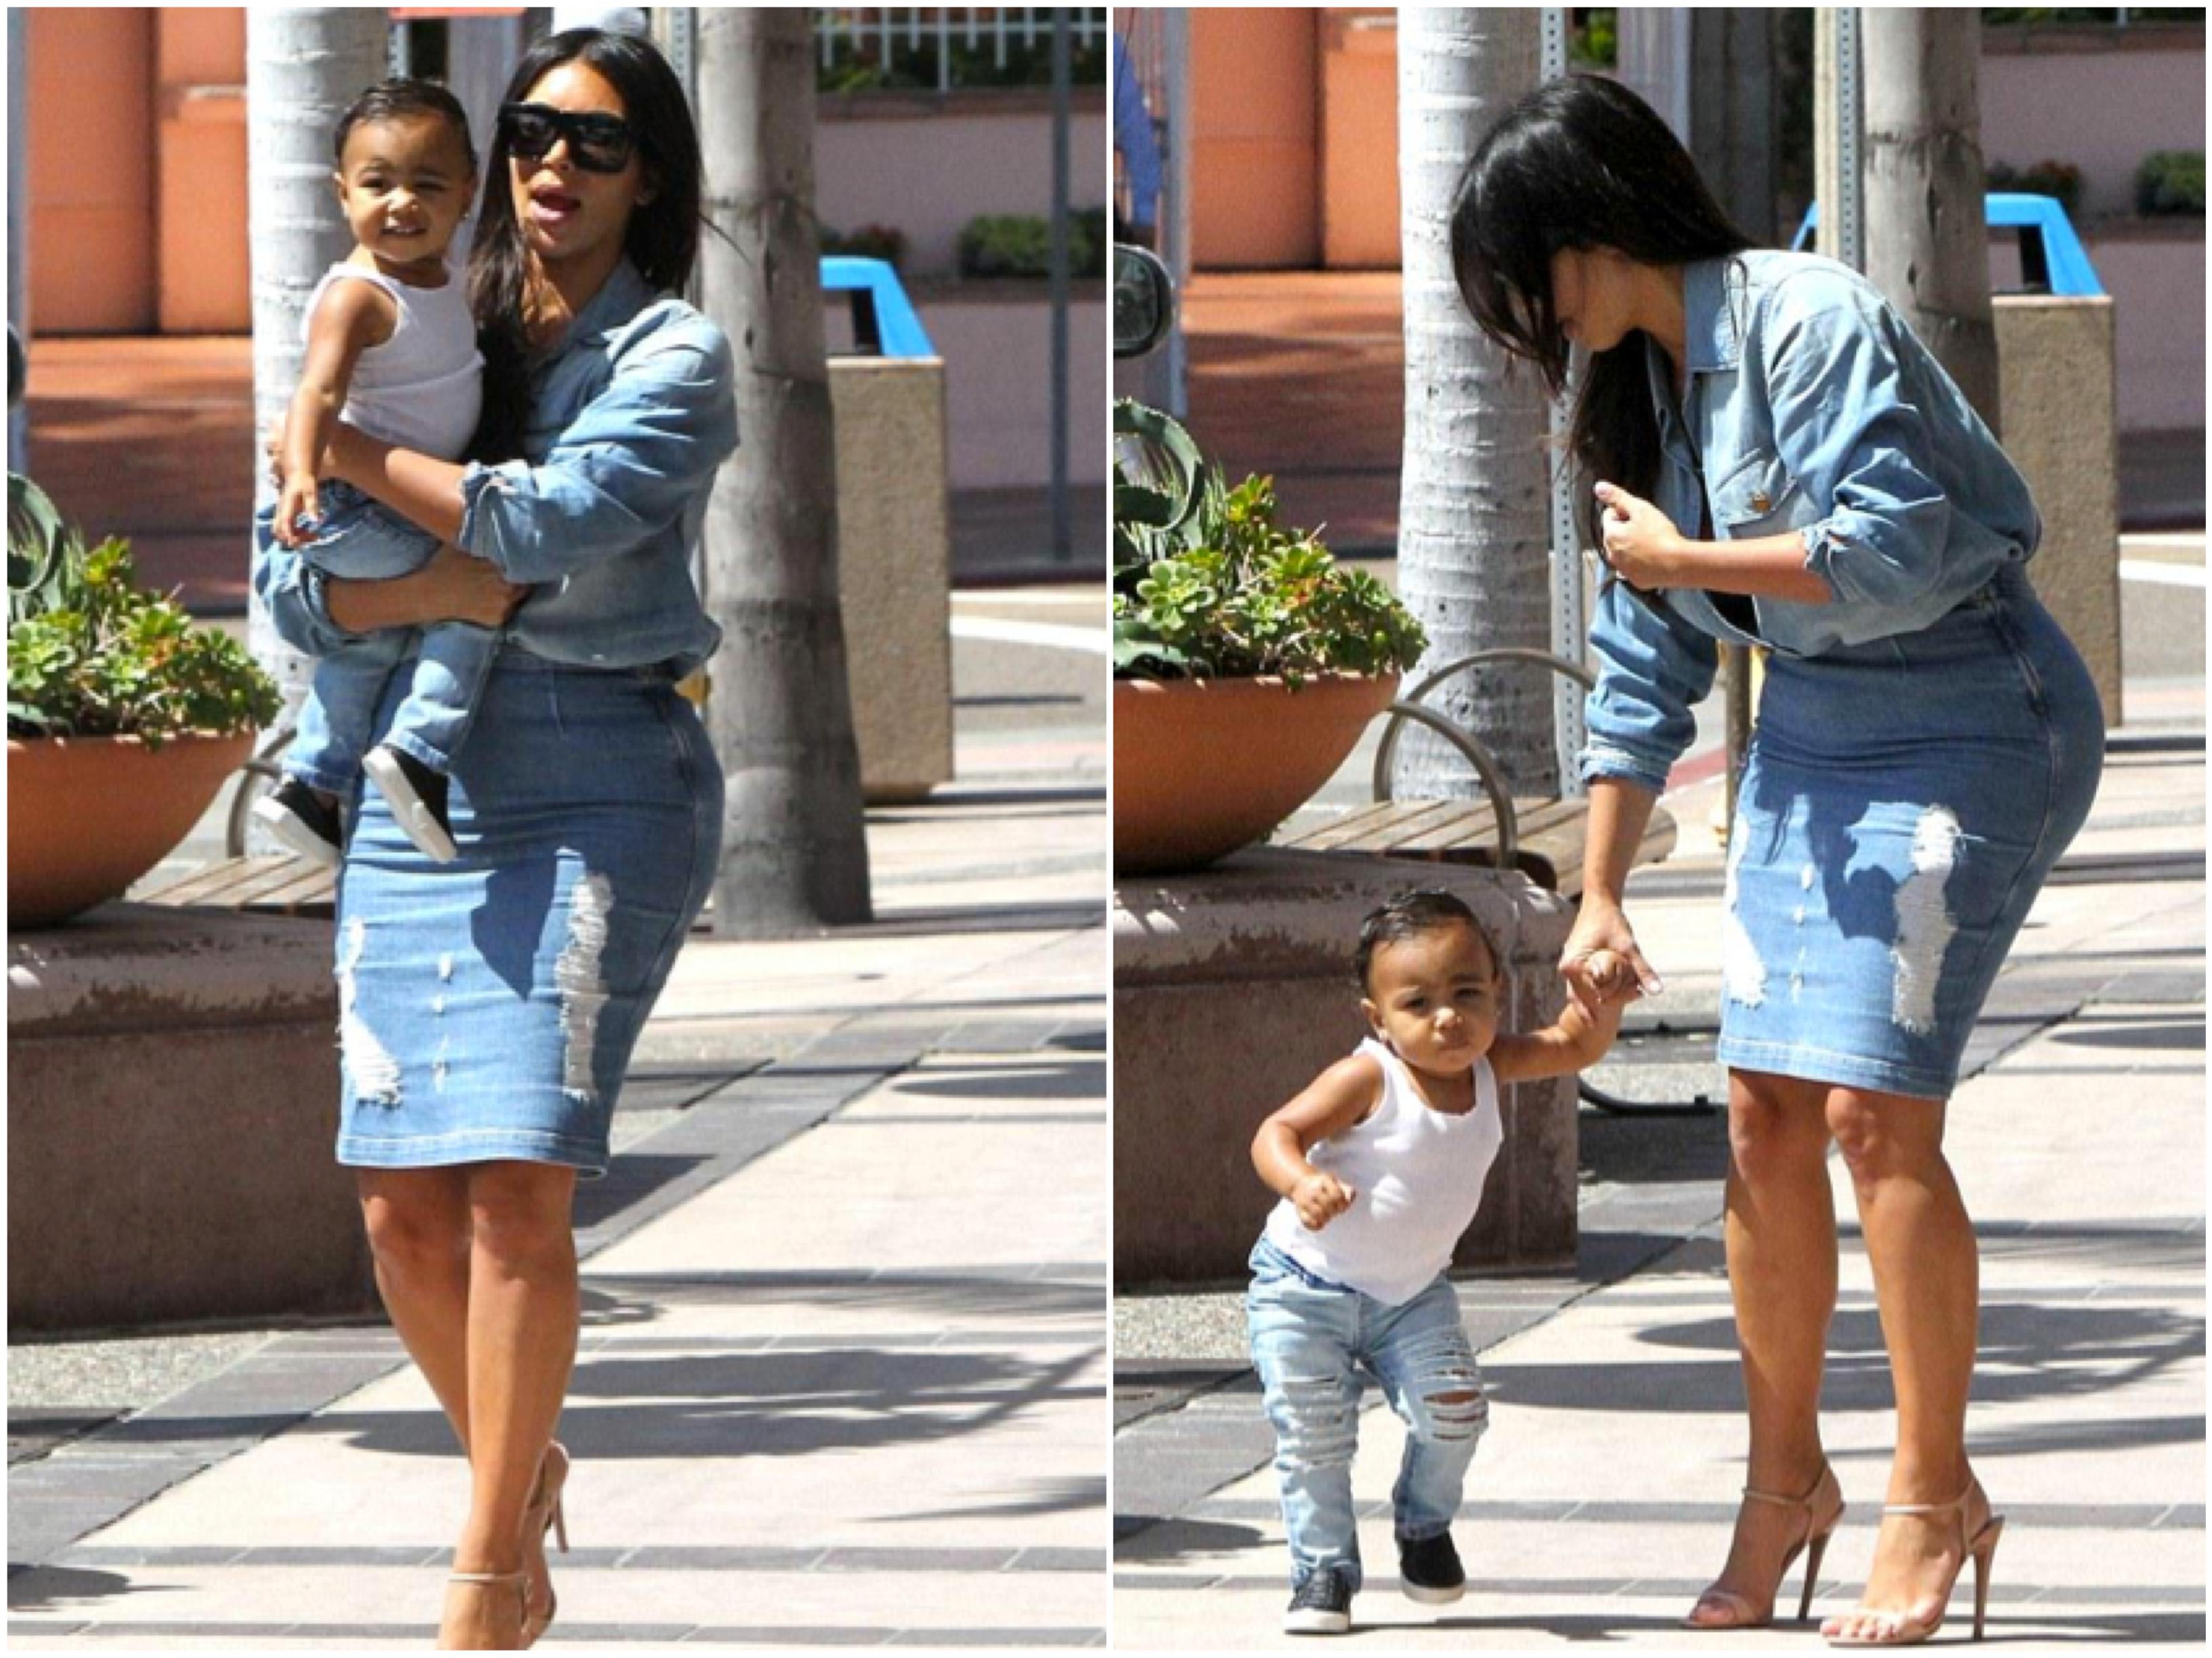 Kim Kardashian North West Walking Photos Denim Skirt Shirt Prada Current Elliot Frame Marianna Hewitt Blog